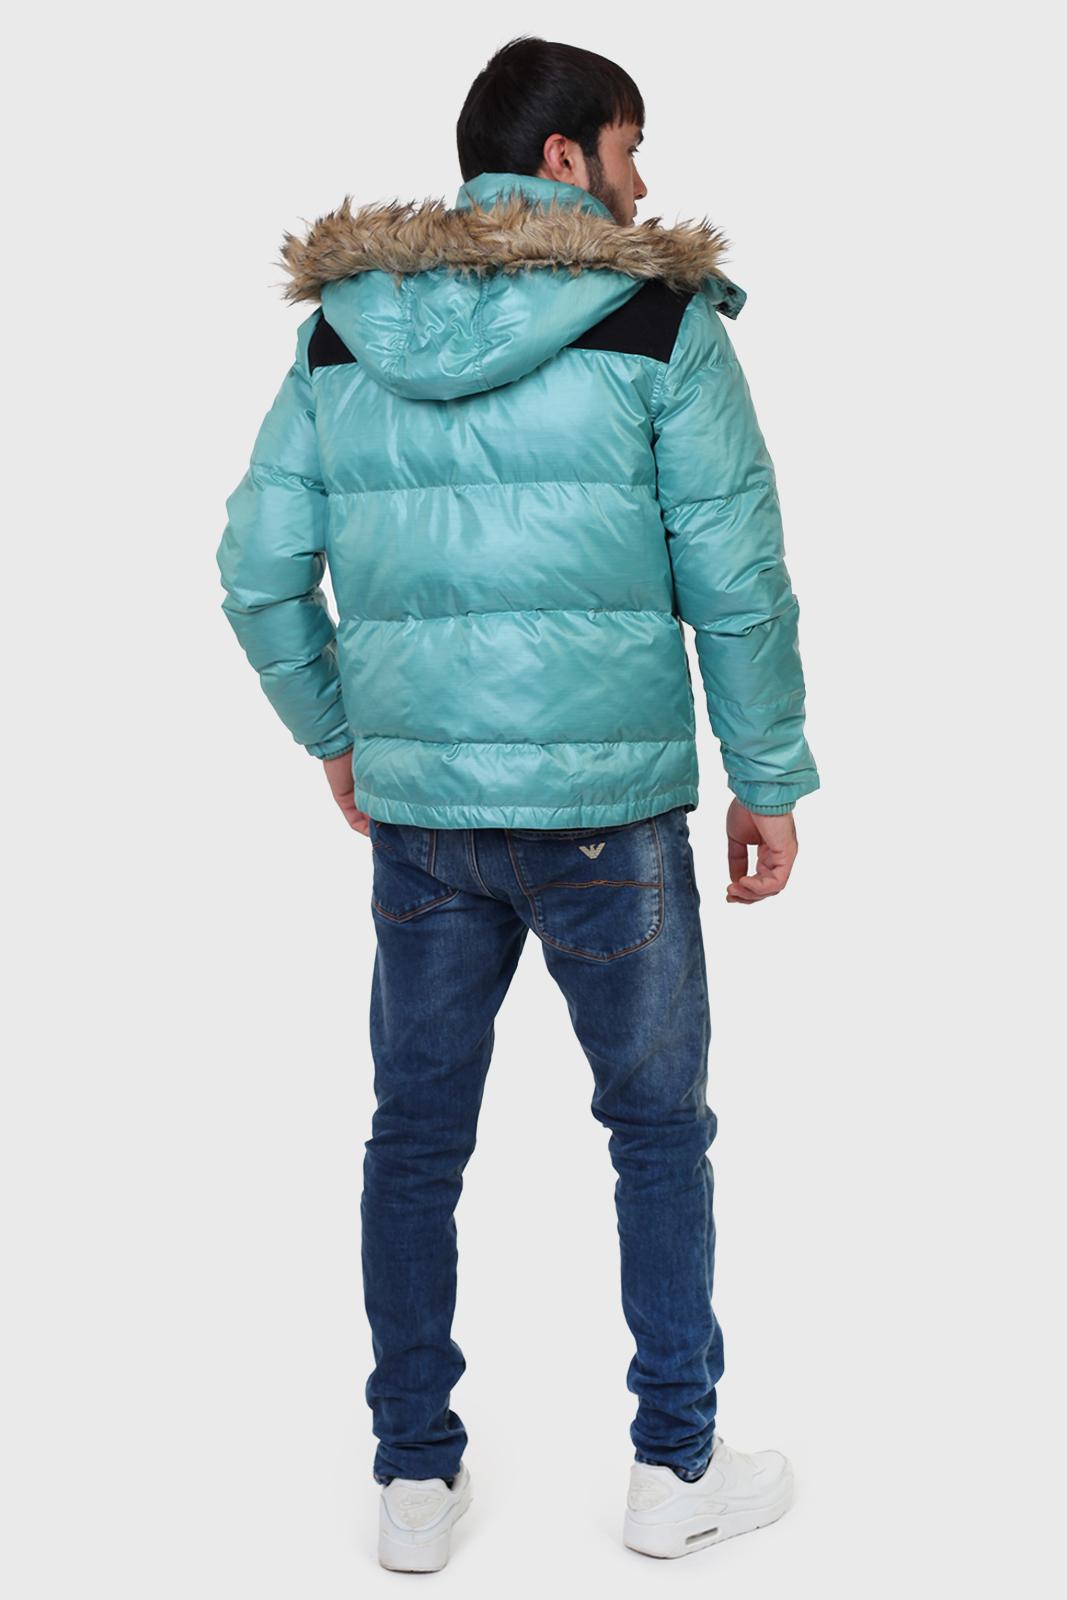 ГИПЕР теплая мужская куртка-пуховик.